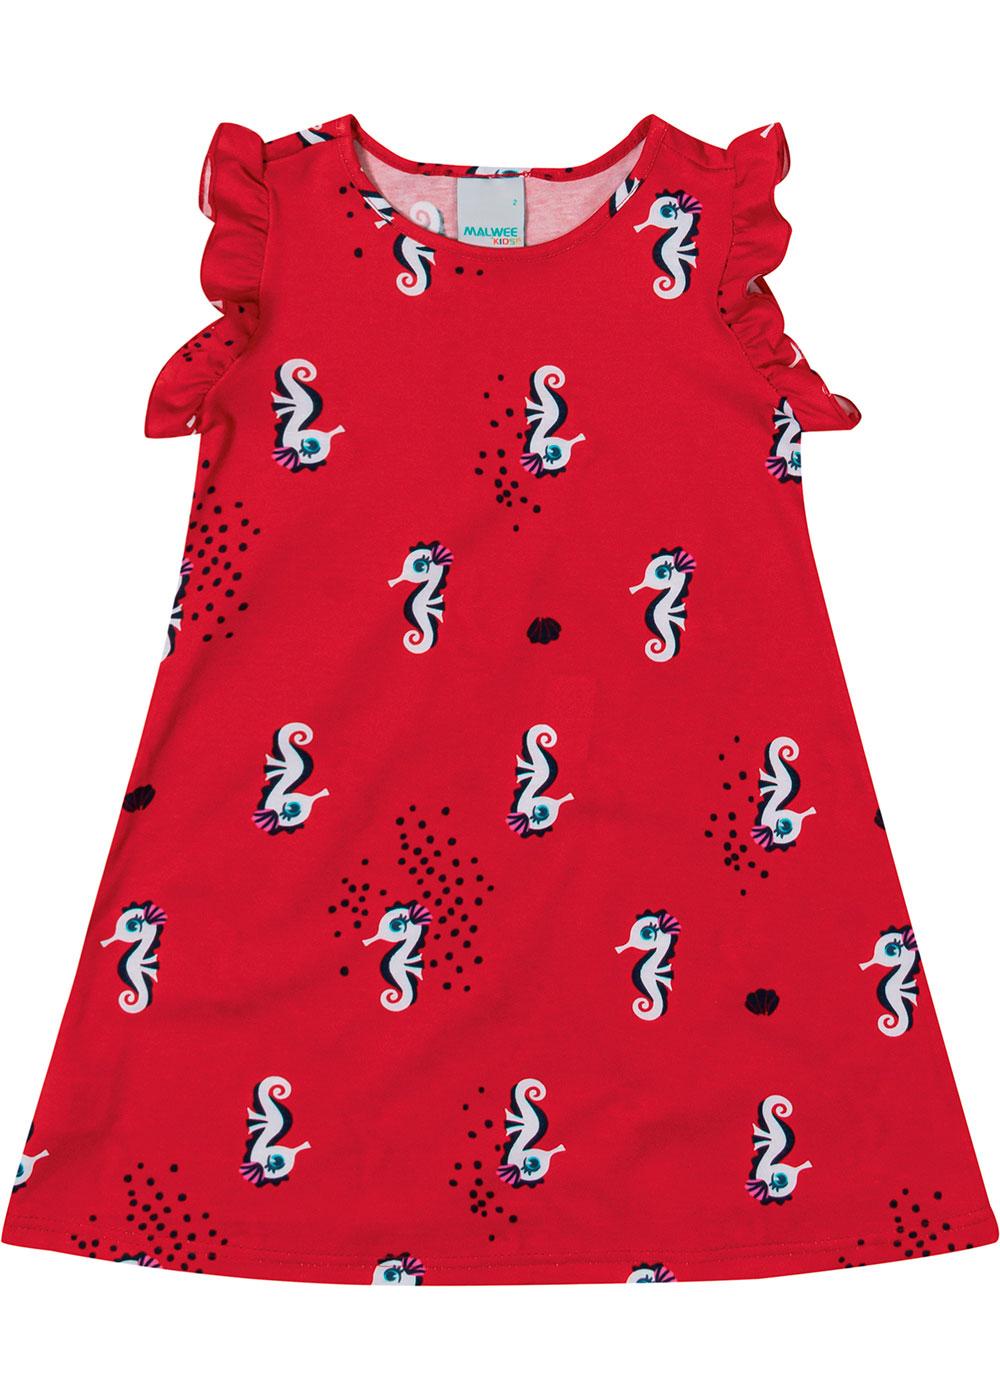 Vestido Infantil Curto Vermelho Cavalo Marinho - Malwee